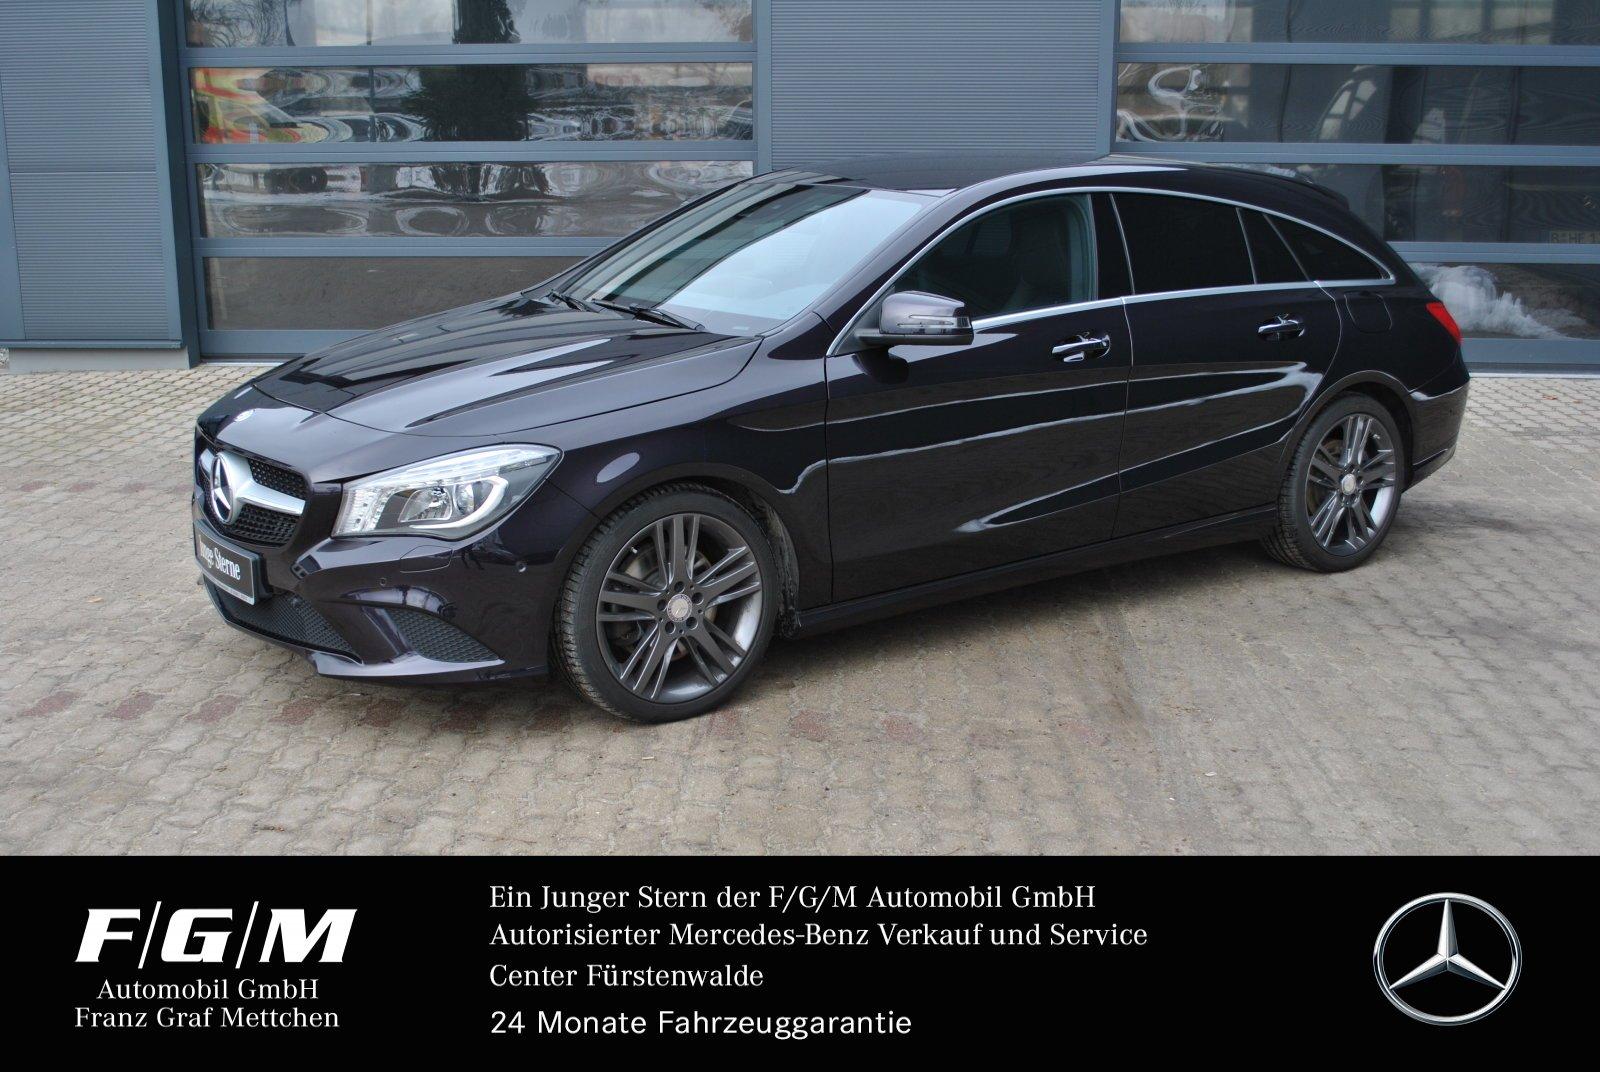 Mercedes-Benz CLA 250 4M SB Urban/Navi/ILS/KeyGo/Exklusiv-Pak, Jahr 2016, Benzin